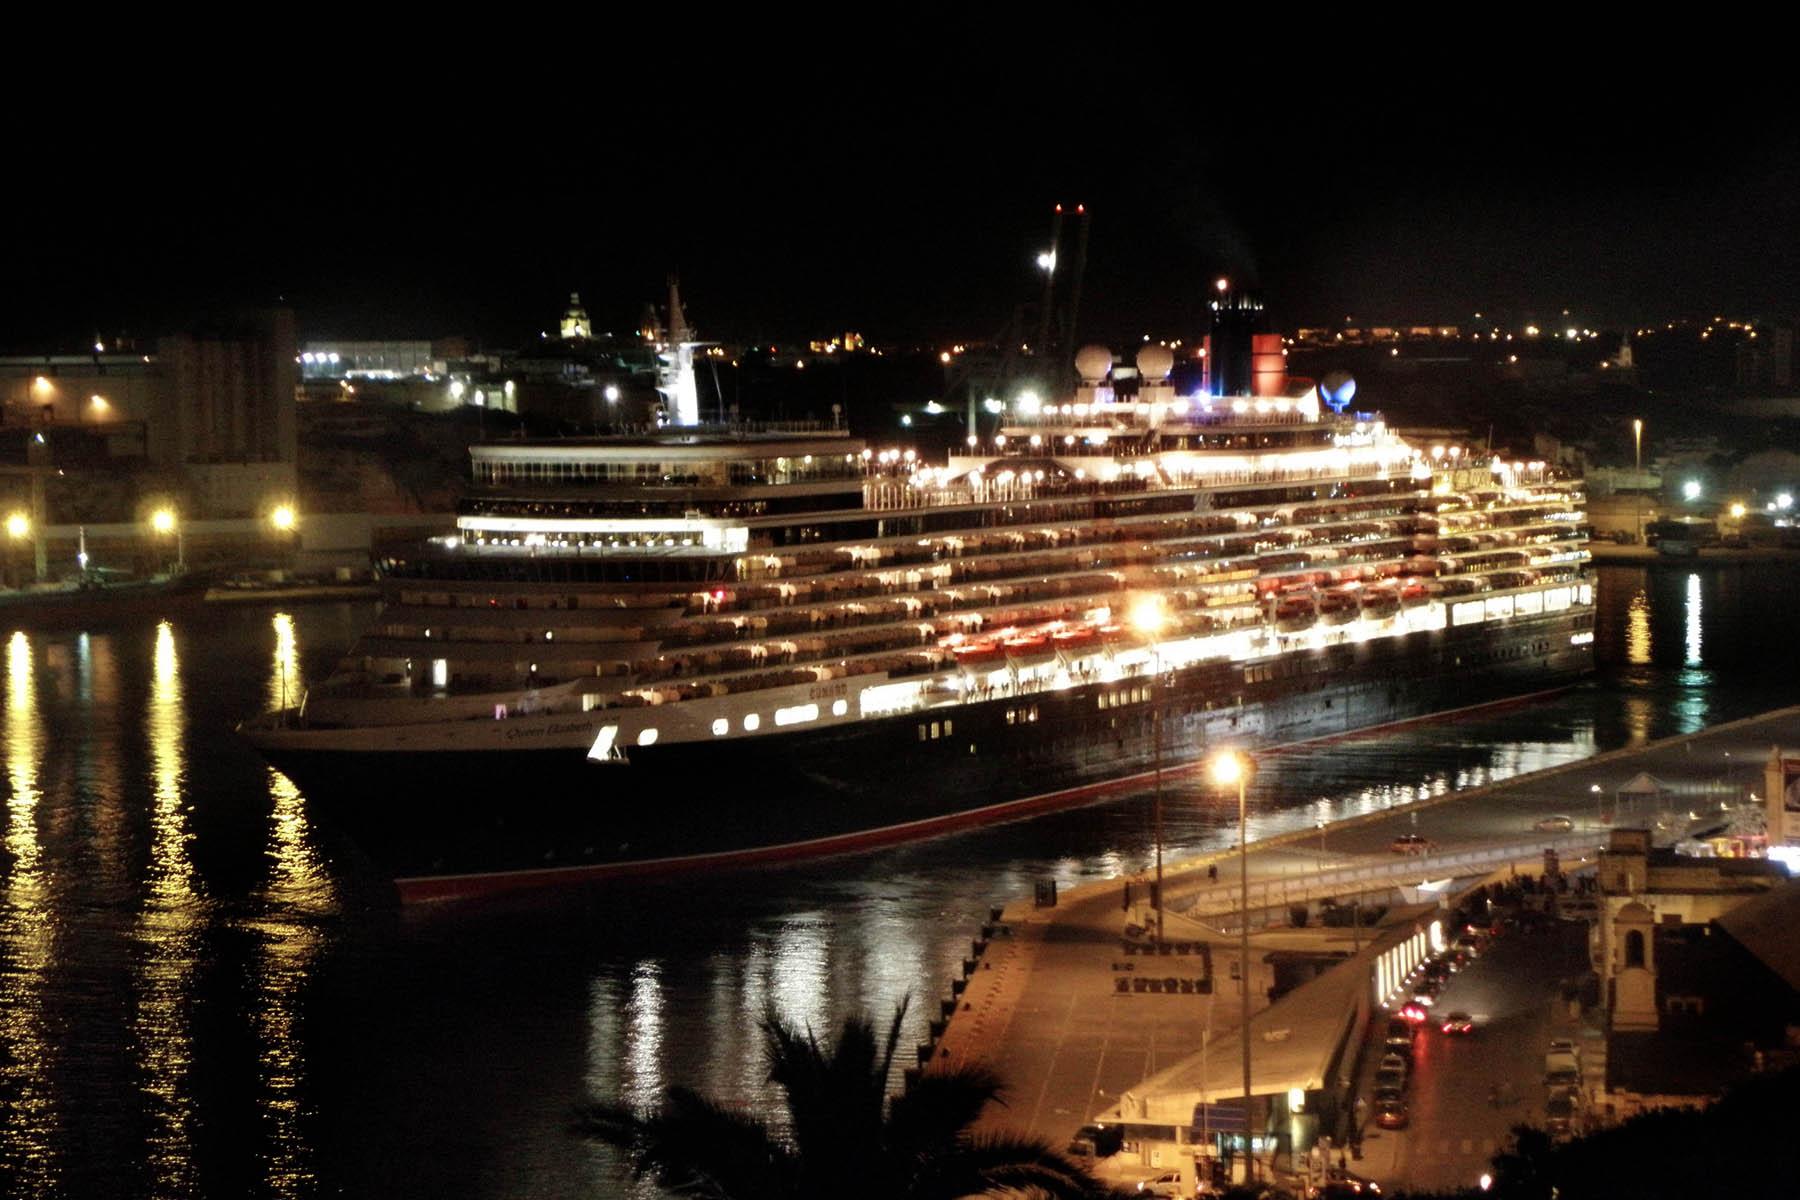 Carnival Corporation & PLC: An Economic Analysis